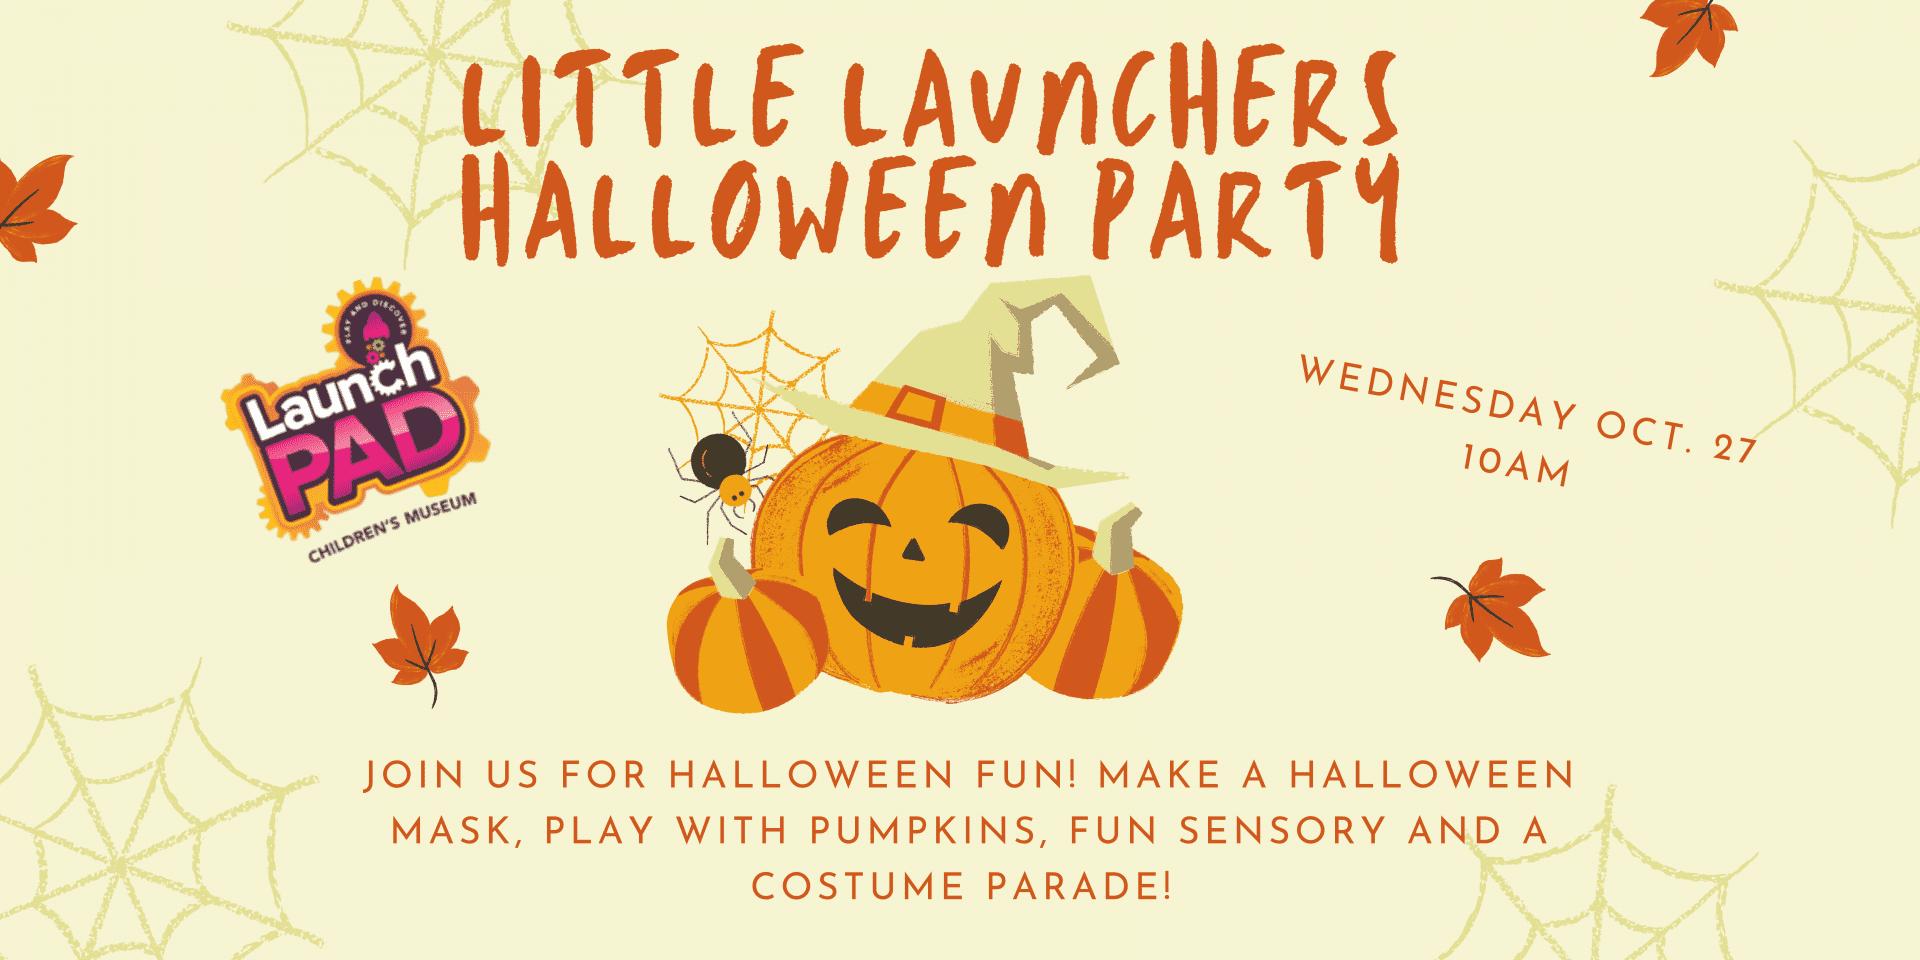 Little Launchers Halloween Party